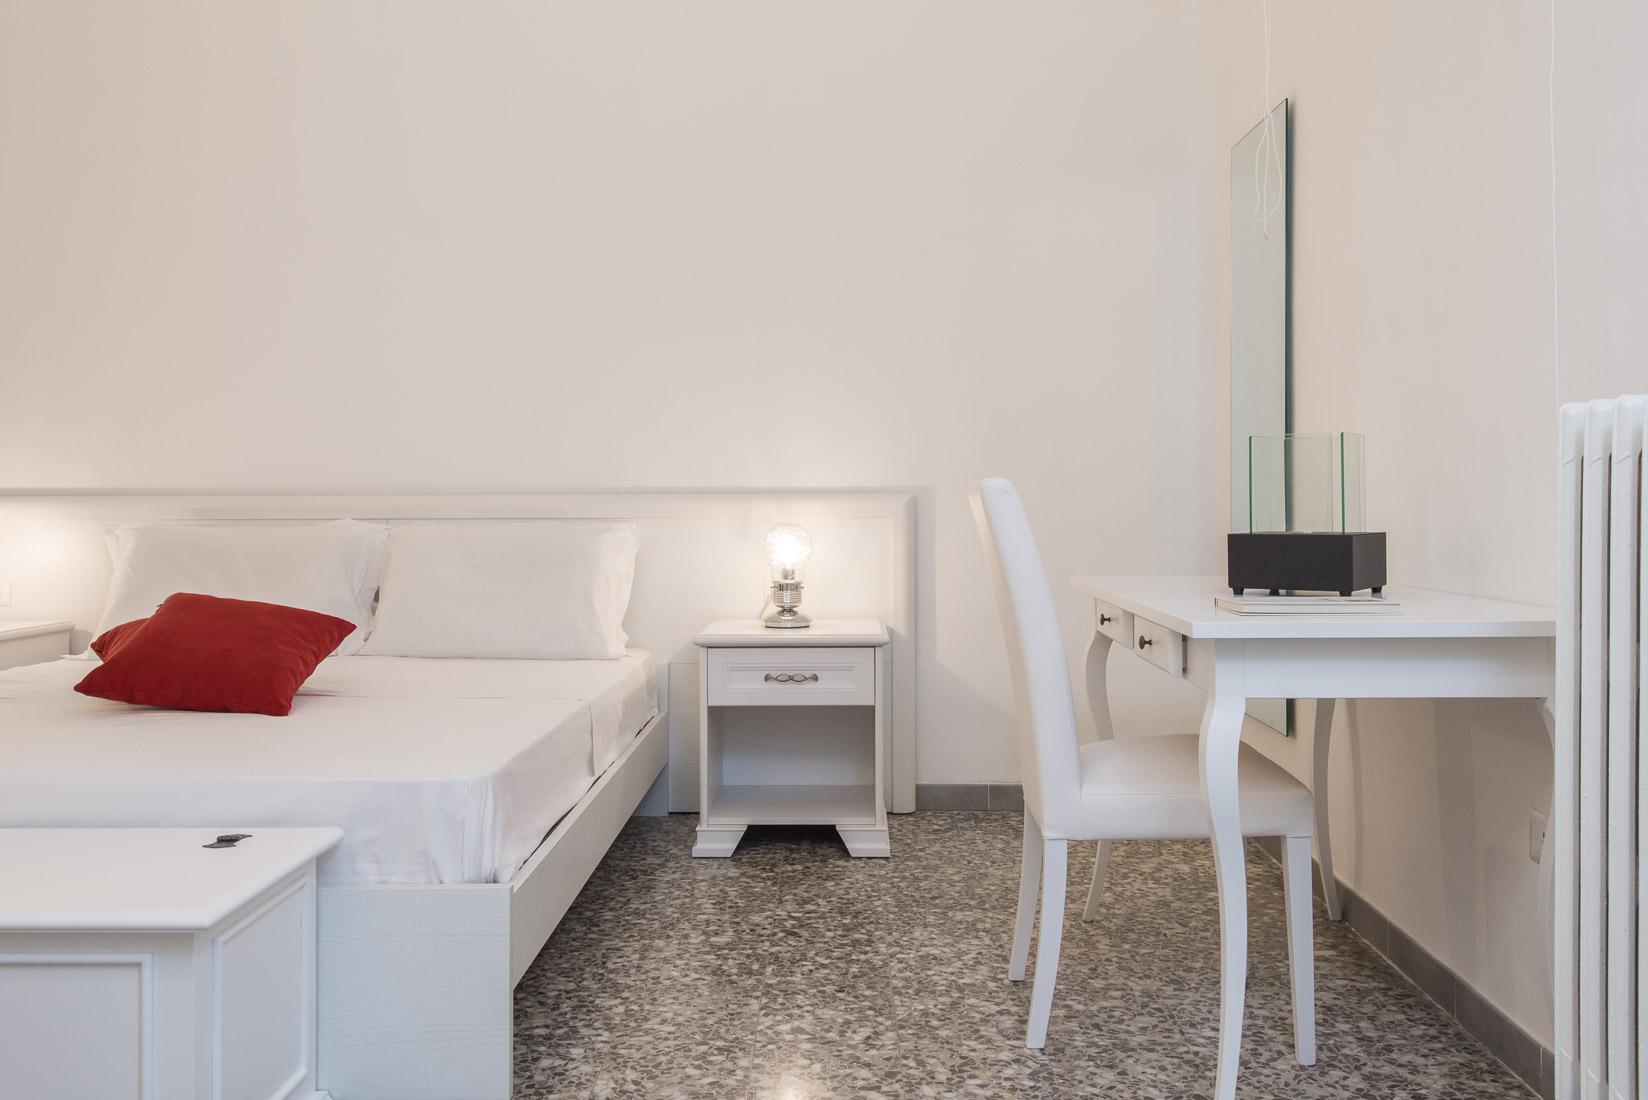 https://www.orlandinifrancesco.com/wp/wp-content/uploads/2019/01/Ada-Suite-Lecce-12.jpg